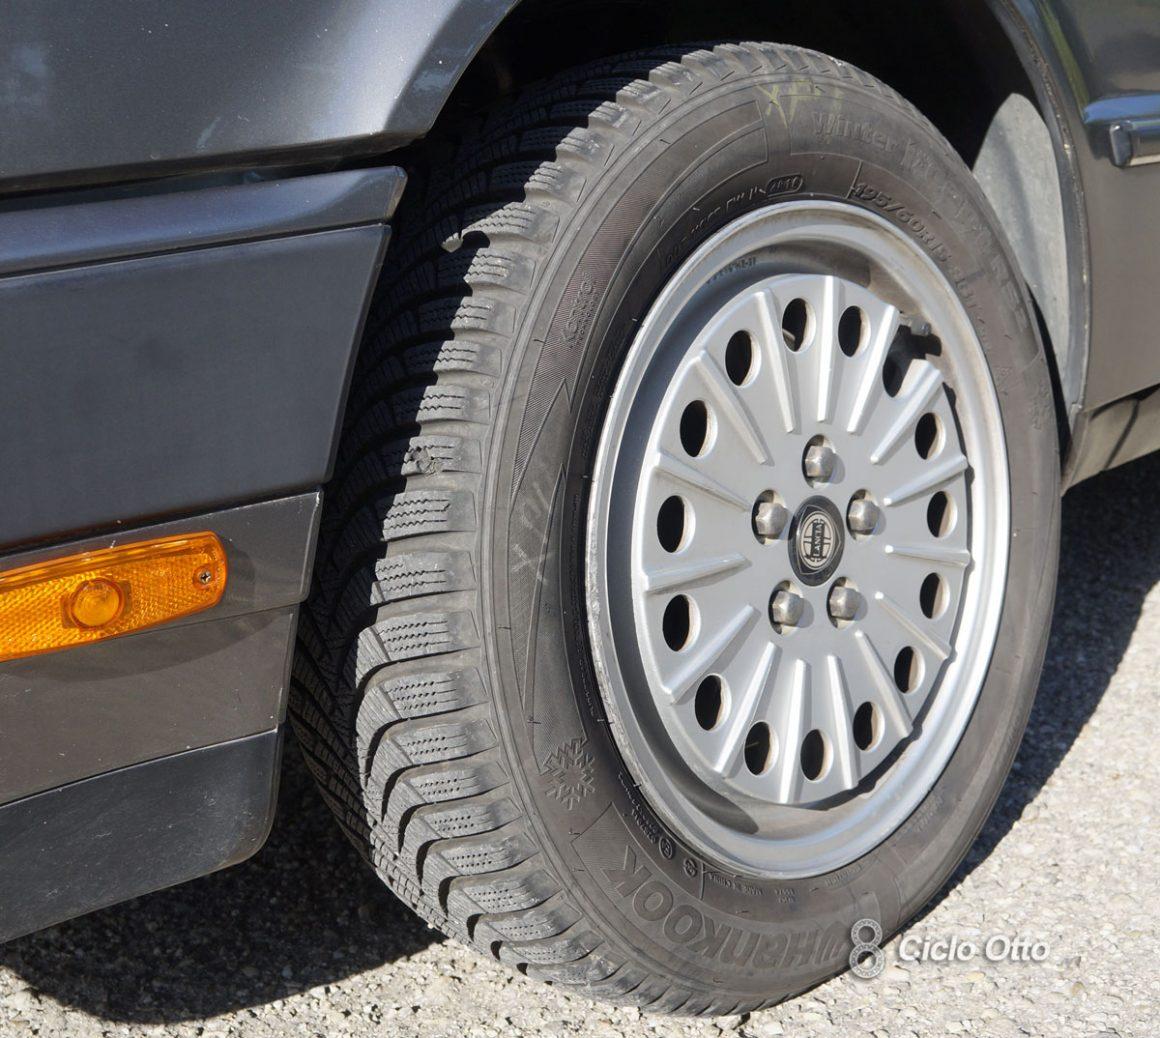 Lancia Thema Limousine - Telaio 009 - Dettaglio anteriore